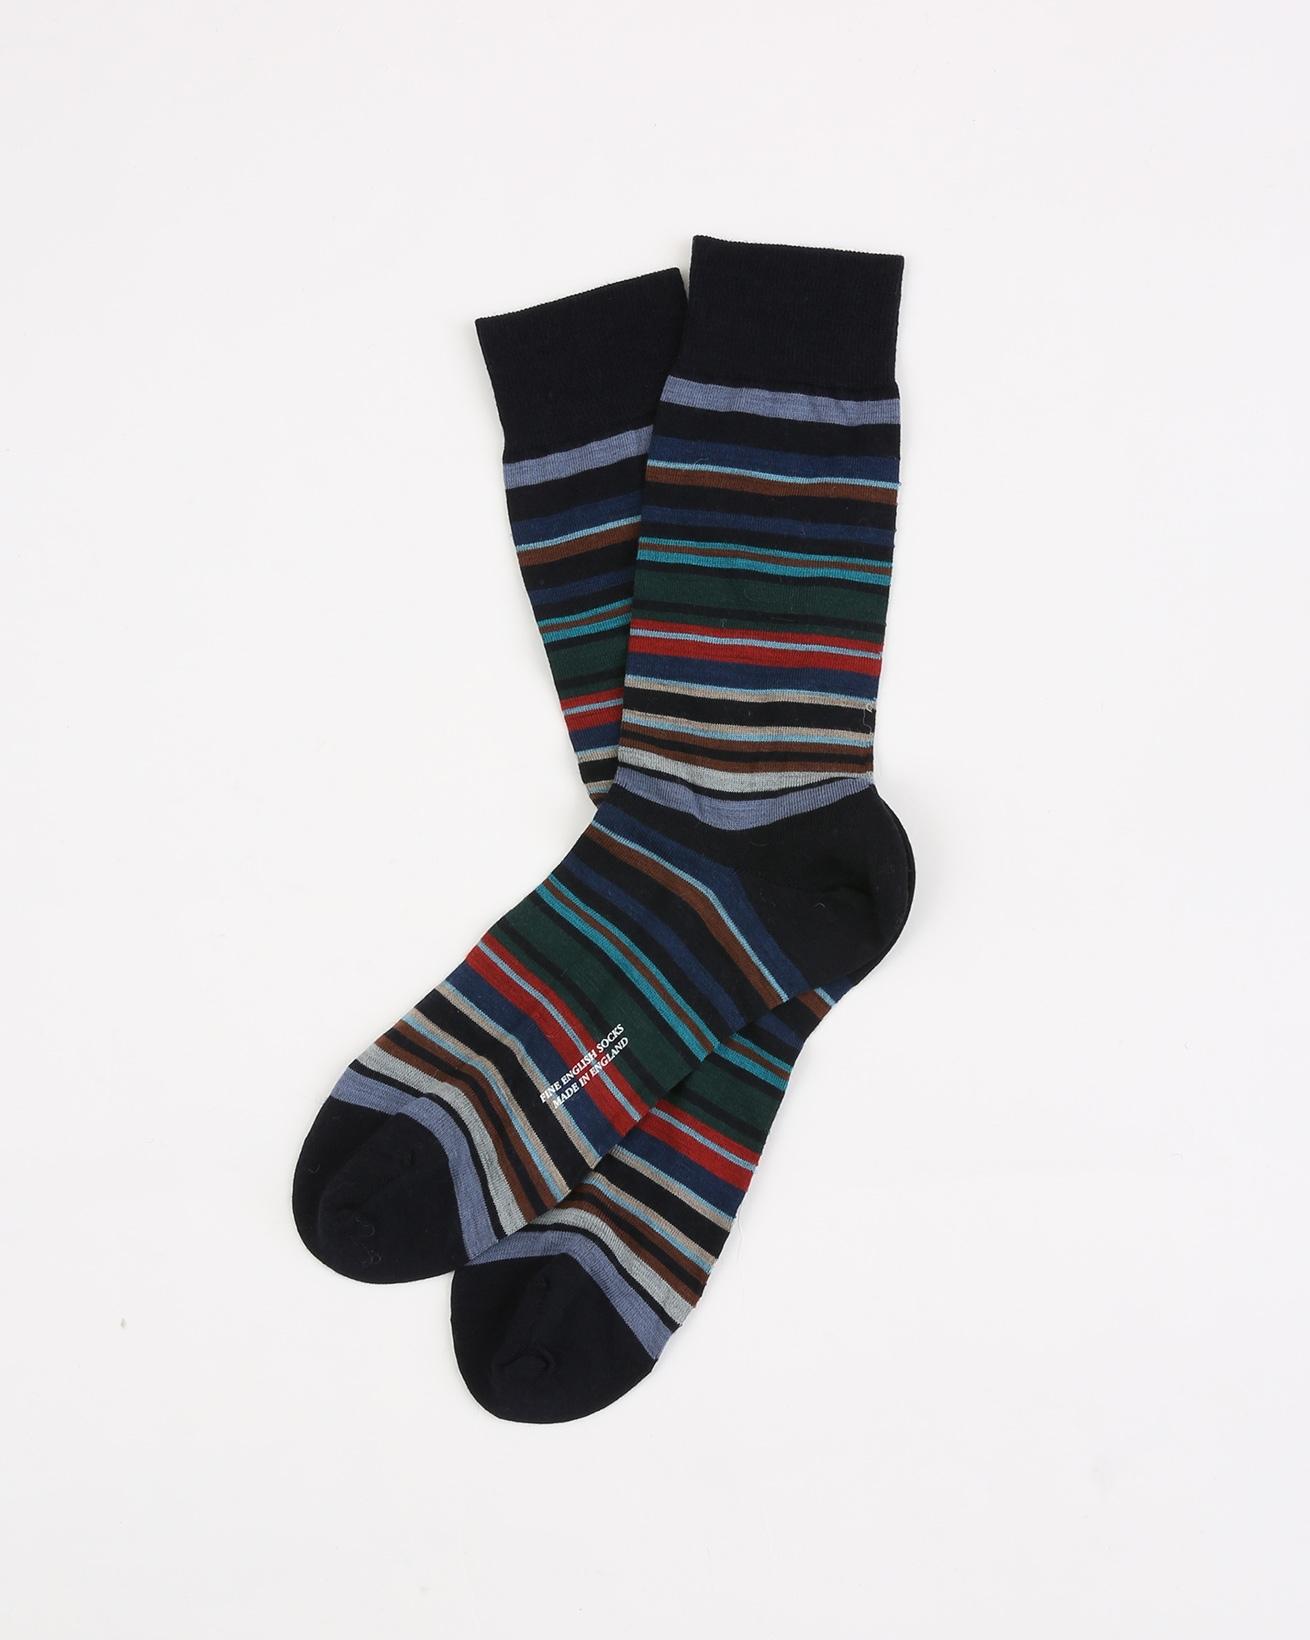 Mens Fine Merino Sock - Size Medium 7.5-9.5 - Navy Multi - 1959